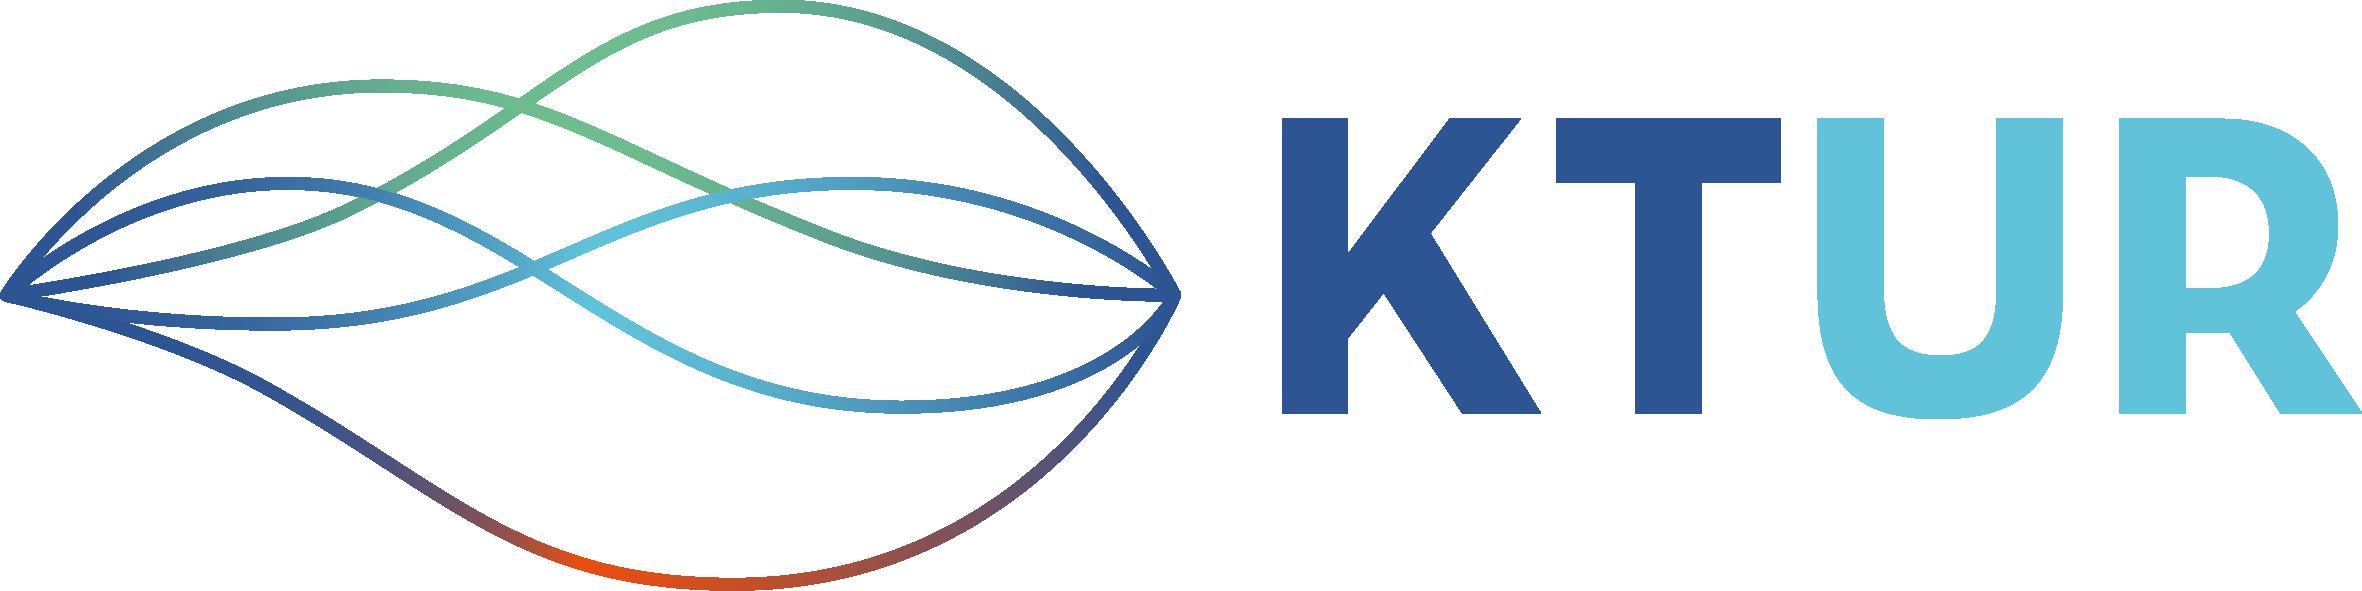 nEcoTox unterstützt EU-Projekt Knowledge Transfer Upper Rhine